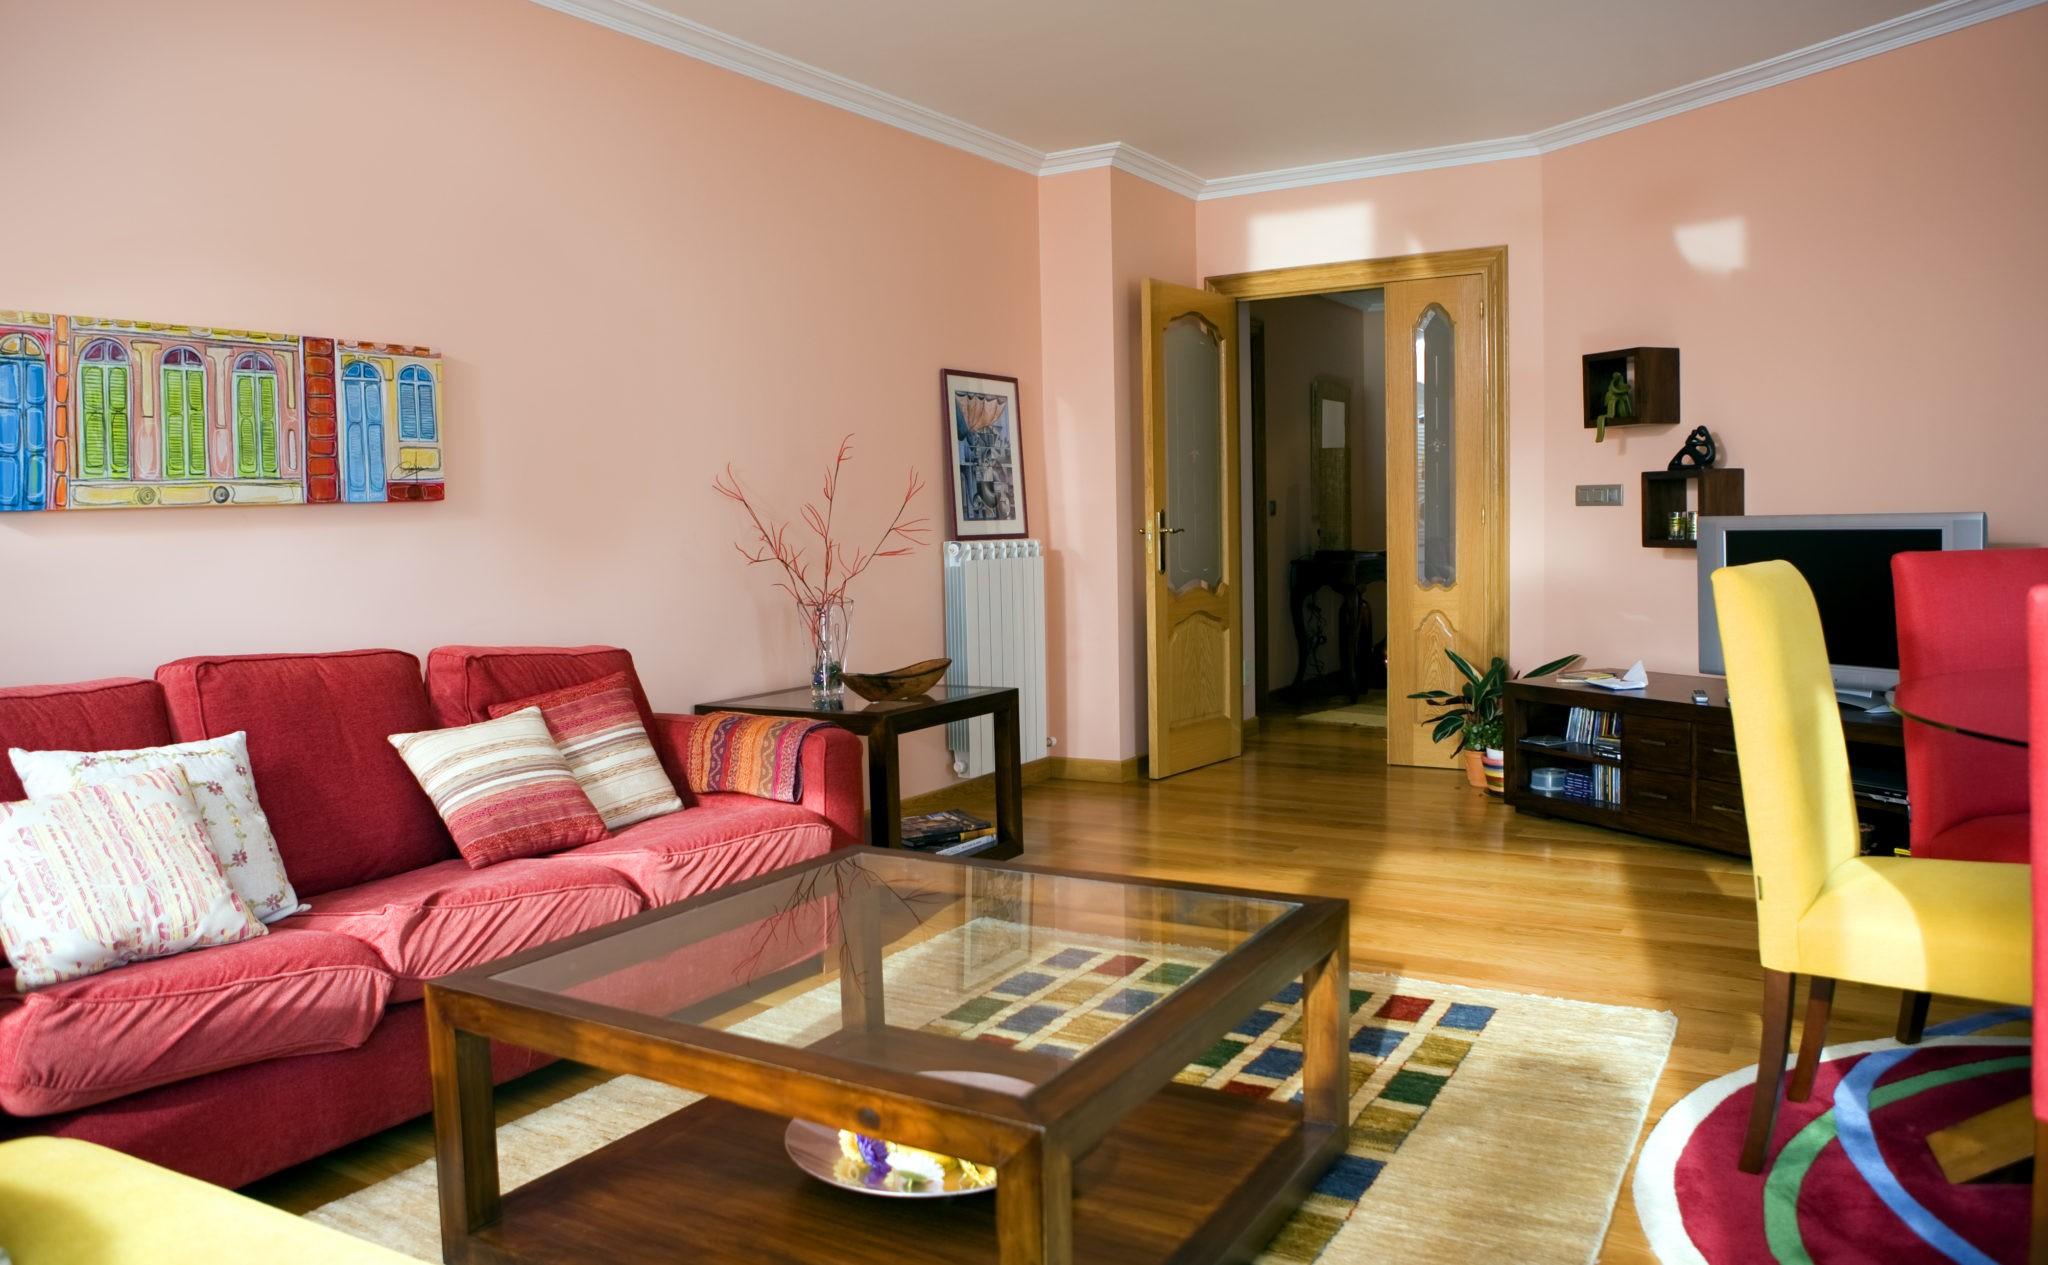 Consejos para decorar el sal n a tu medida casa y color - Consejos para decorar un salon ...